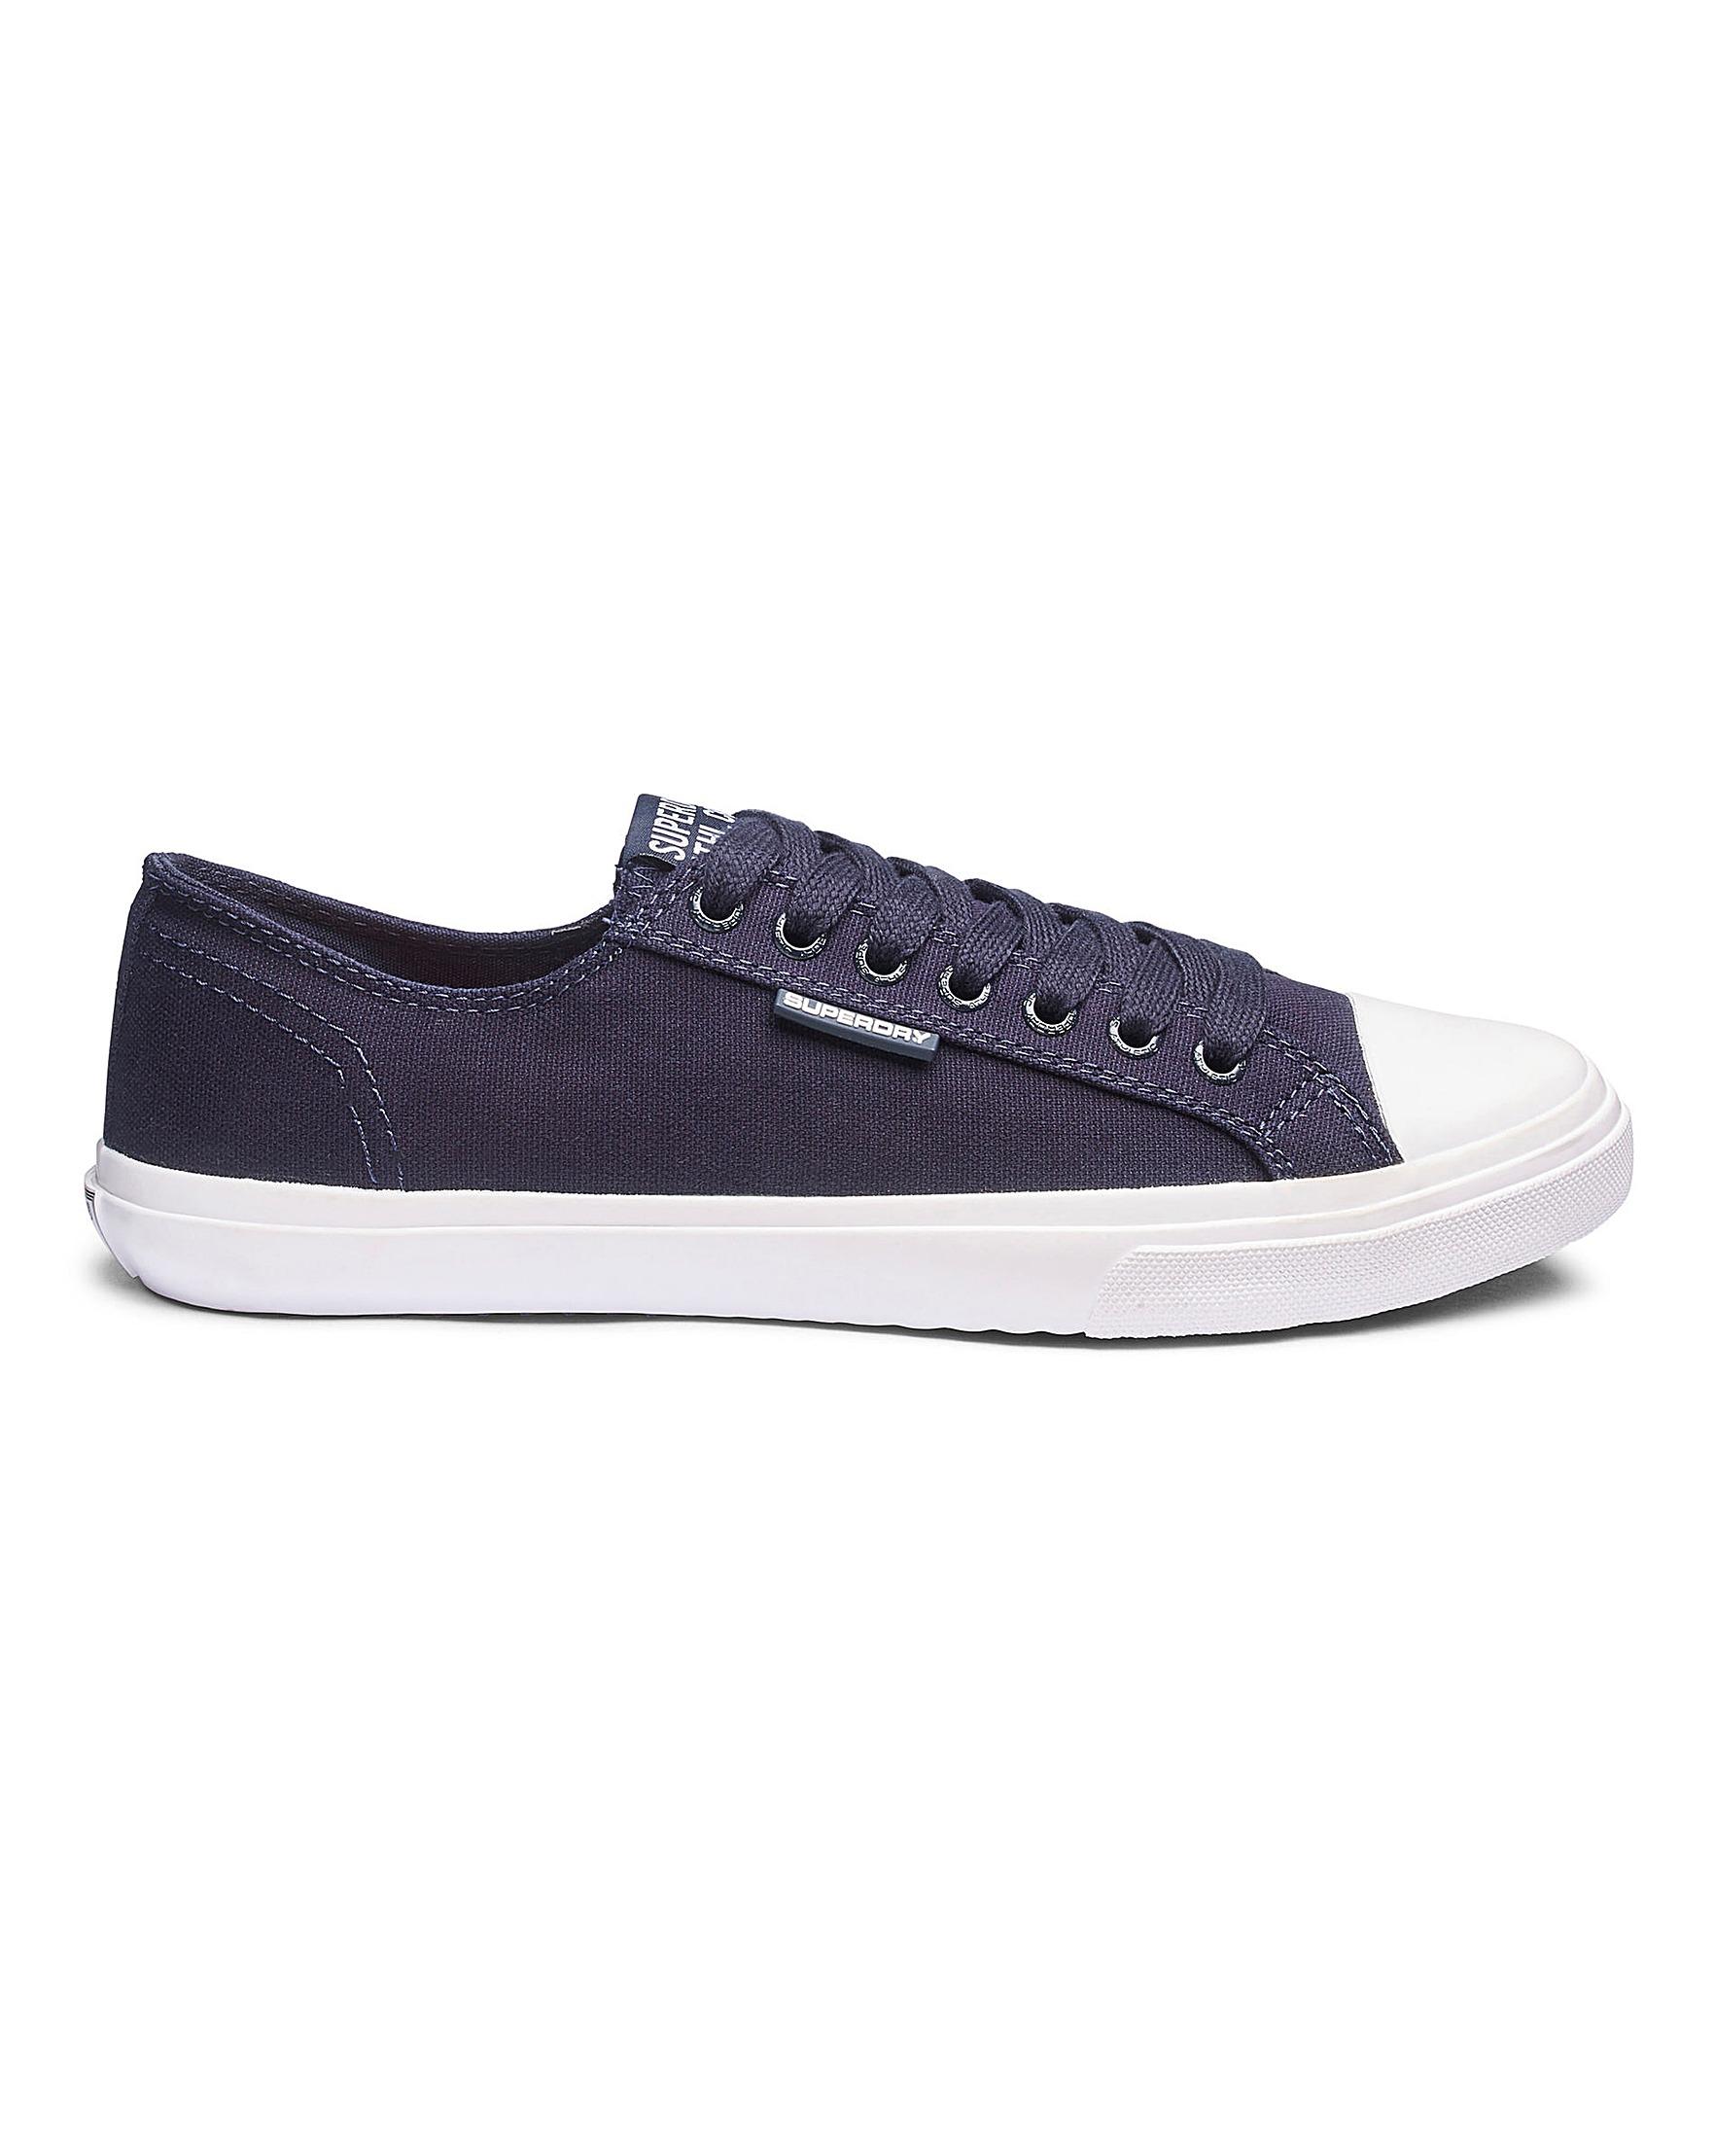 9b05cf2d35bee Superdry Low Pro Sneaker